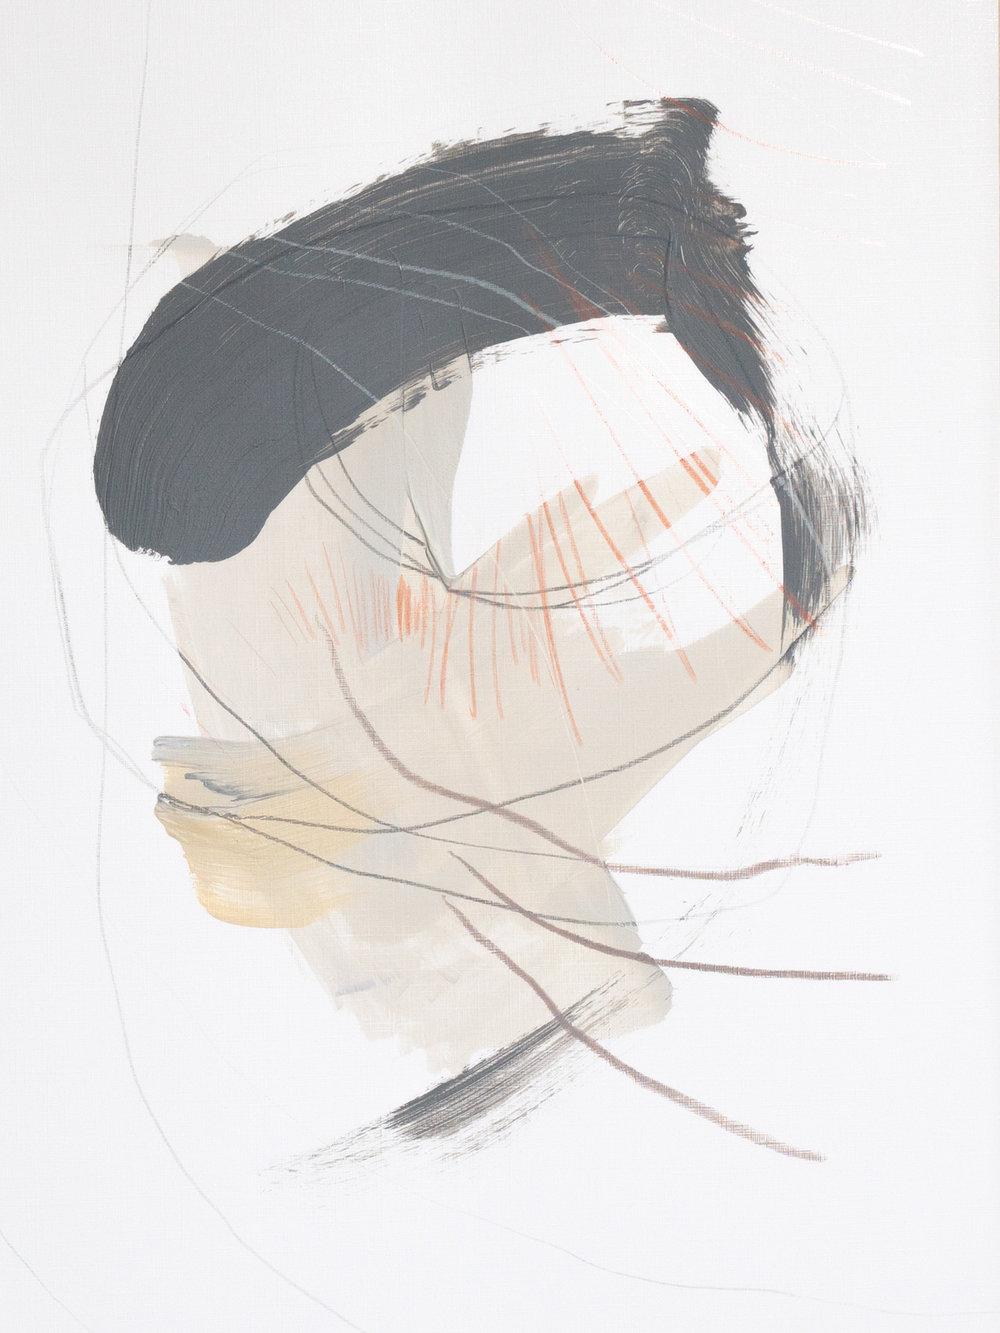 2018_Paintings_RebeccaRuetten_Rehe_2_1-2.jpg